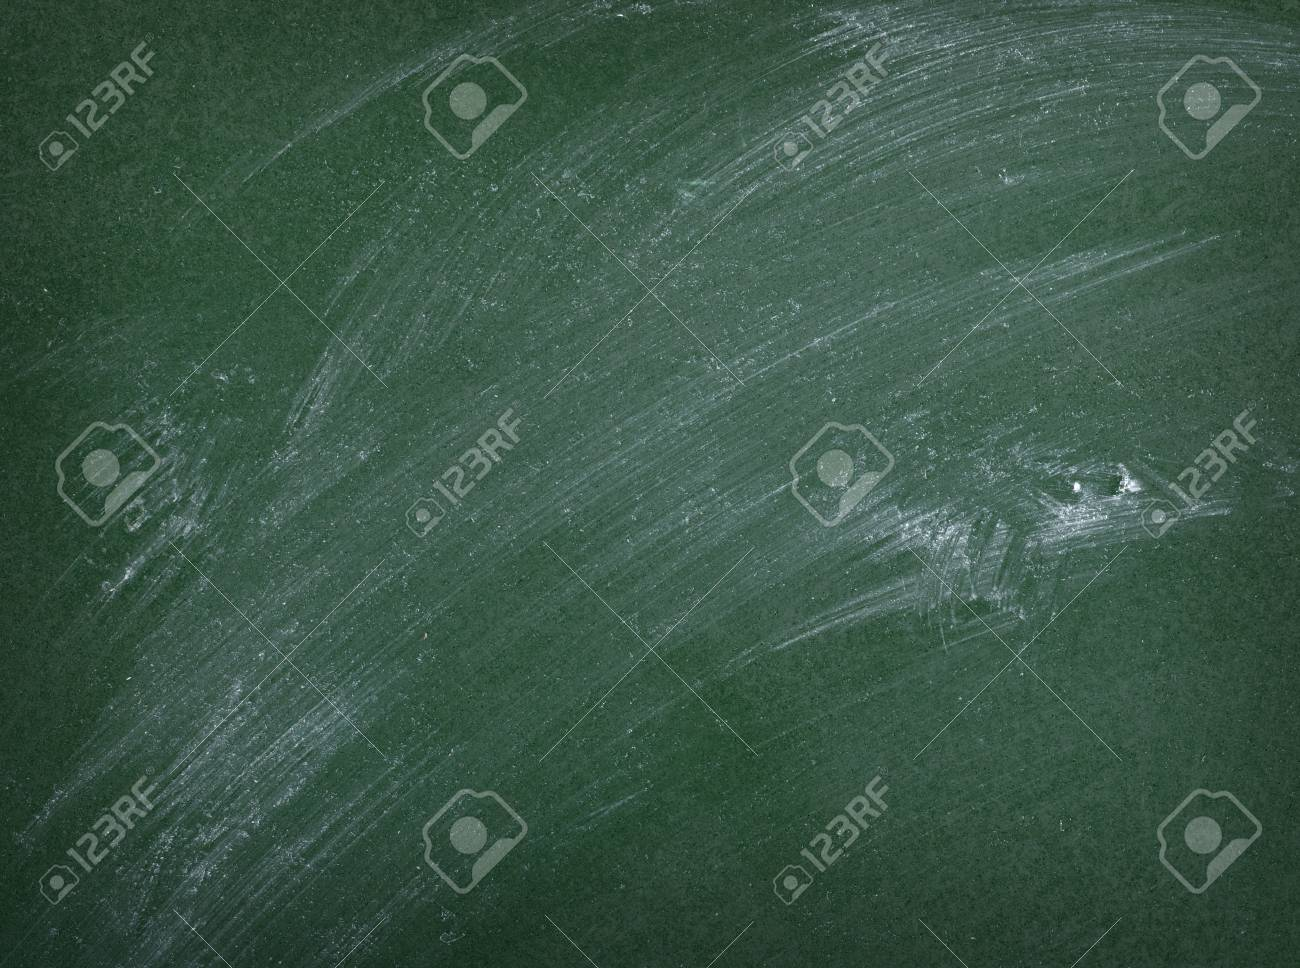 close up of an empty school chalkboard Stock Photo - 9071353